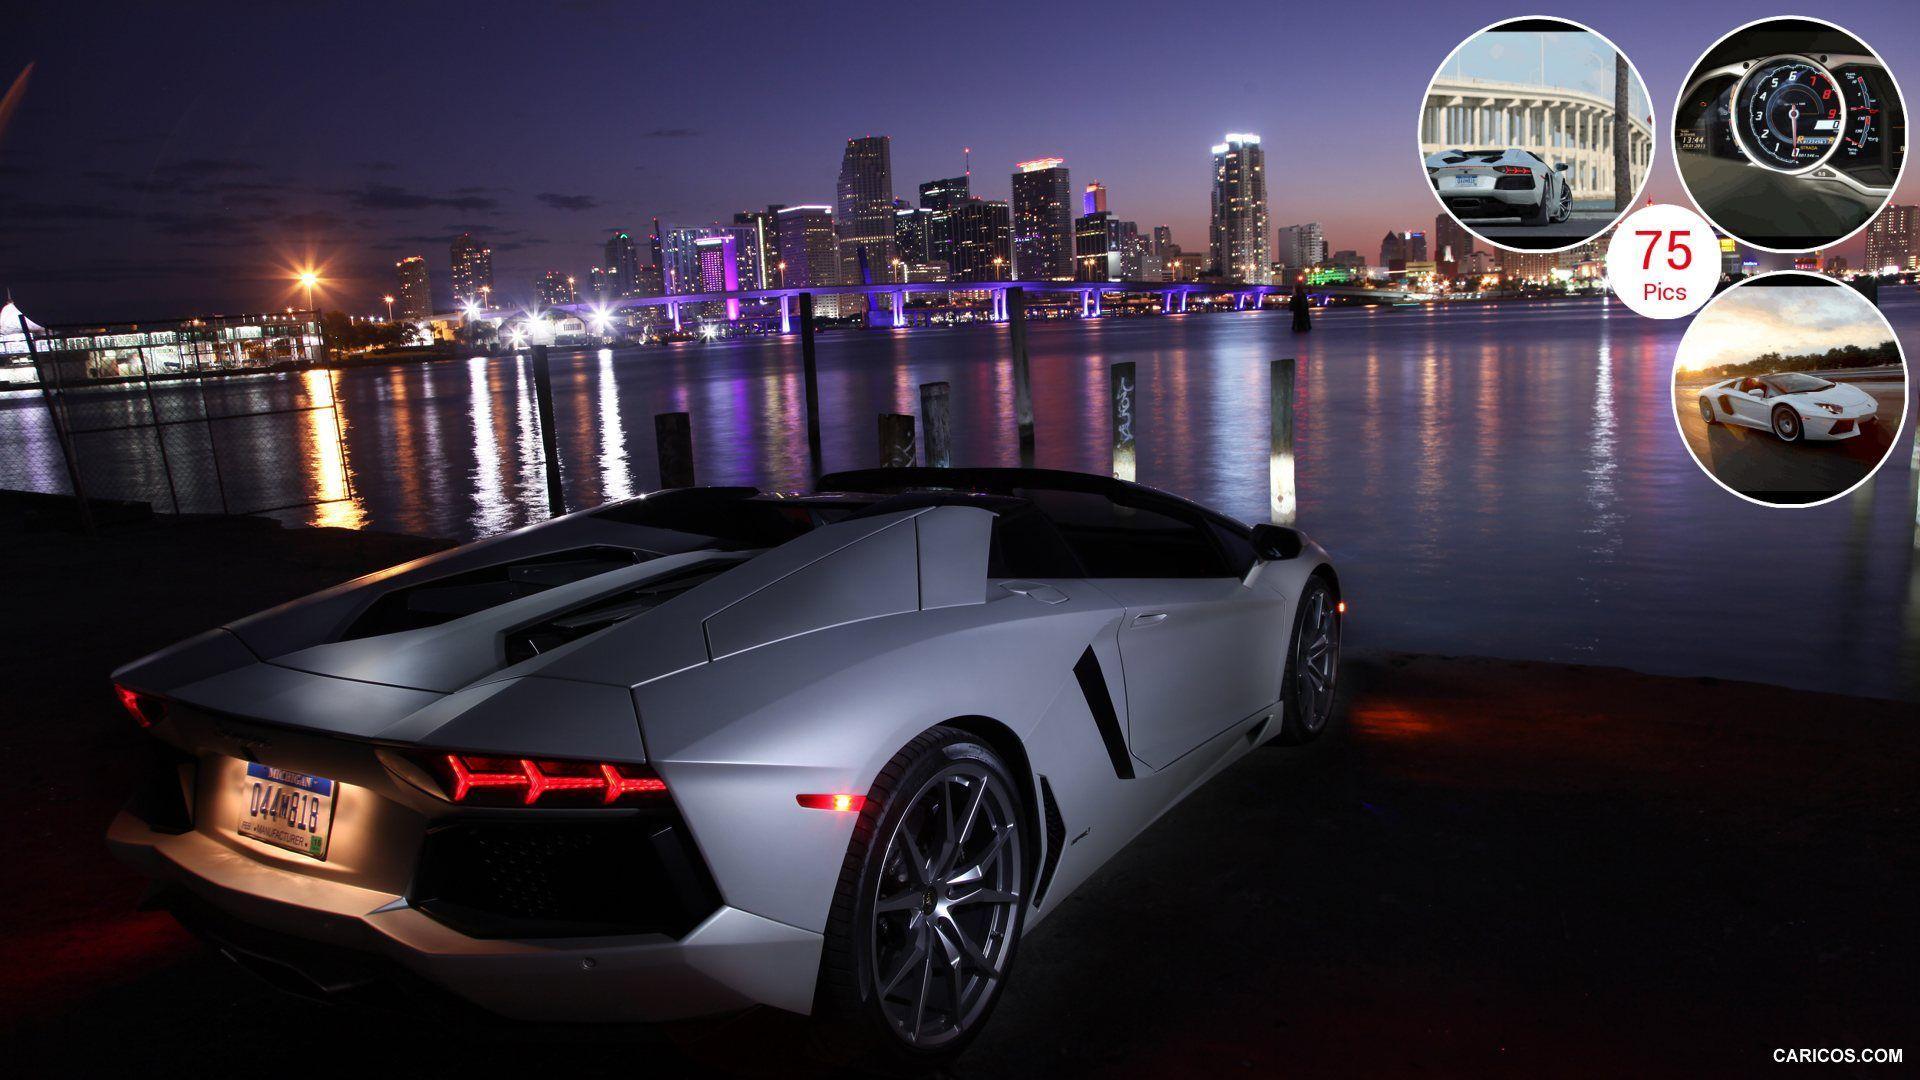 Lamborghini Aventador Wallpapers Top Free Lamborghini Aventador